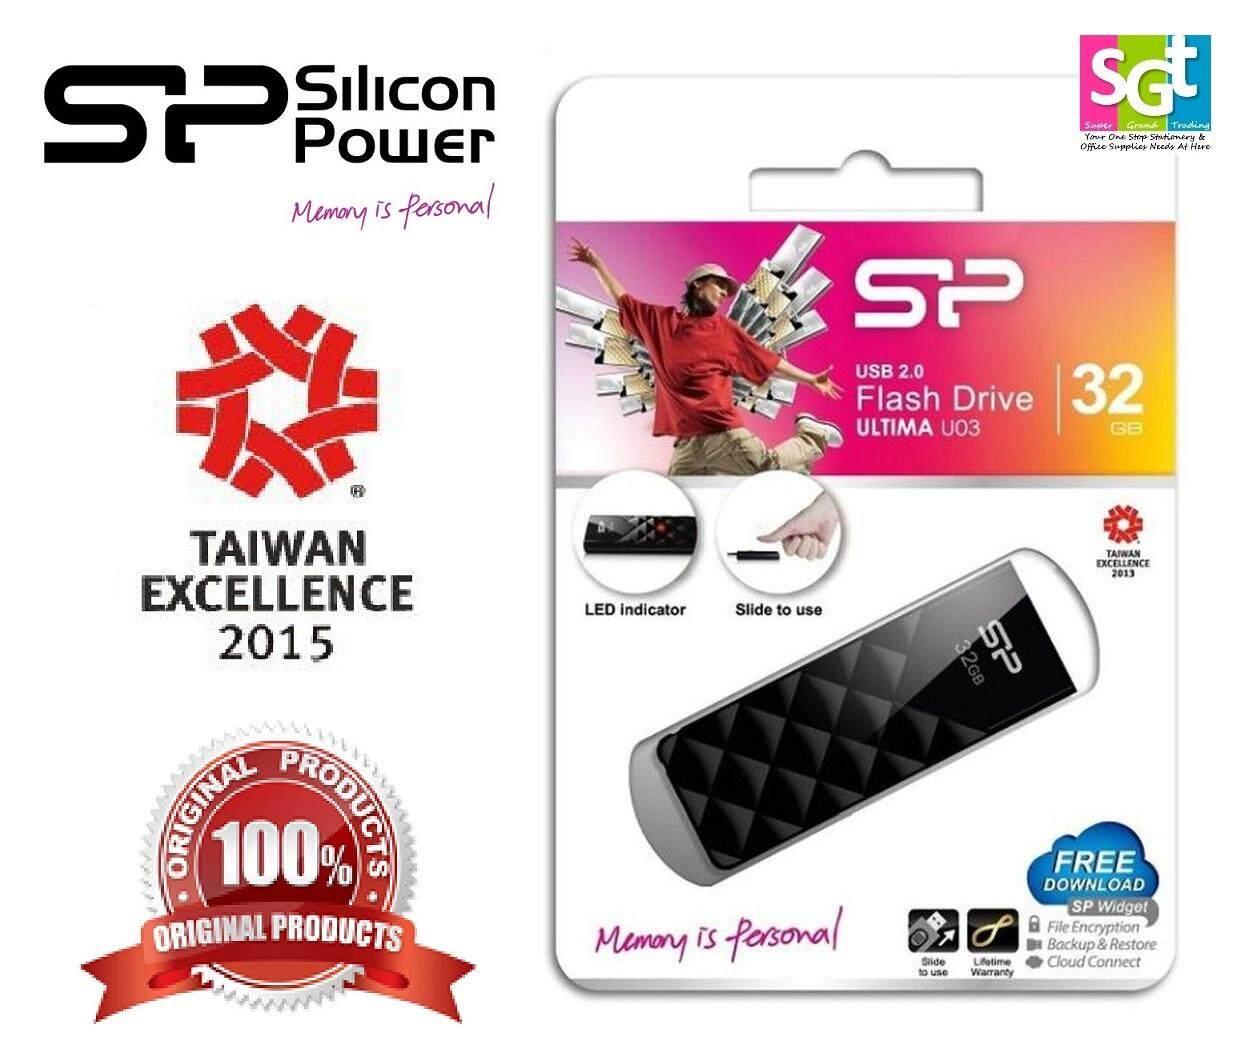 Silicon Power Ultima U03 32GB USB 2.0 Flash Drive